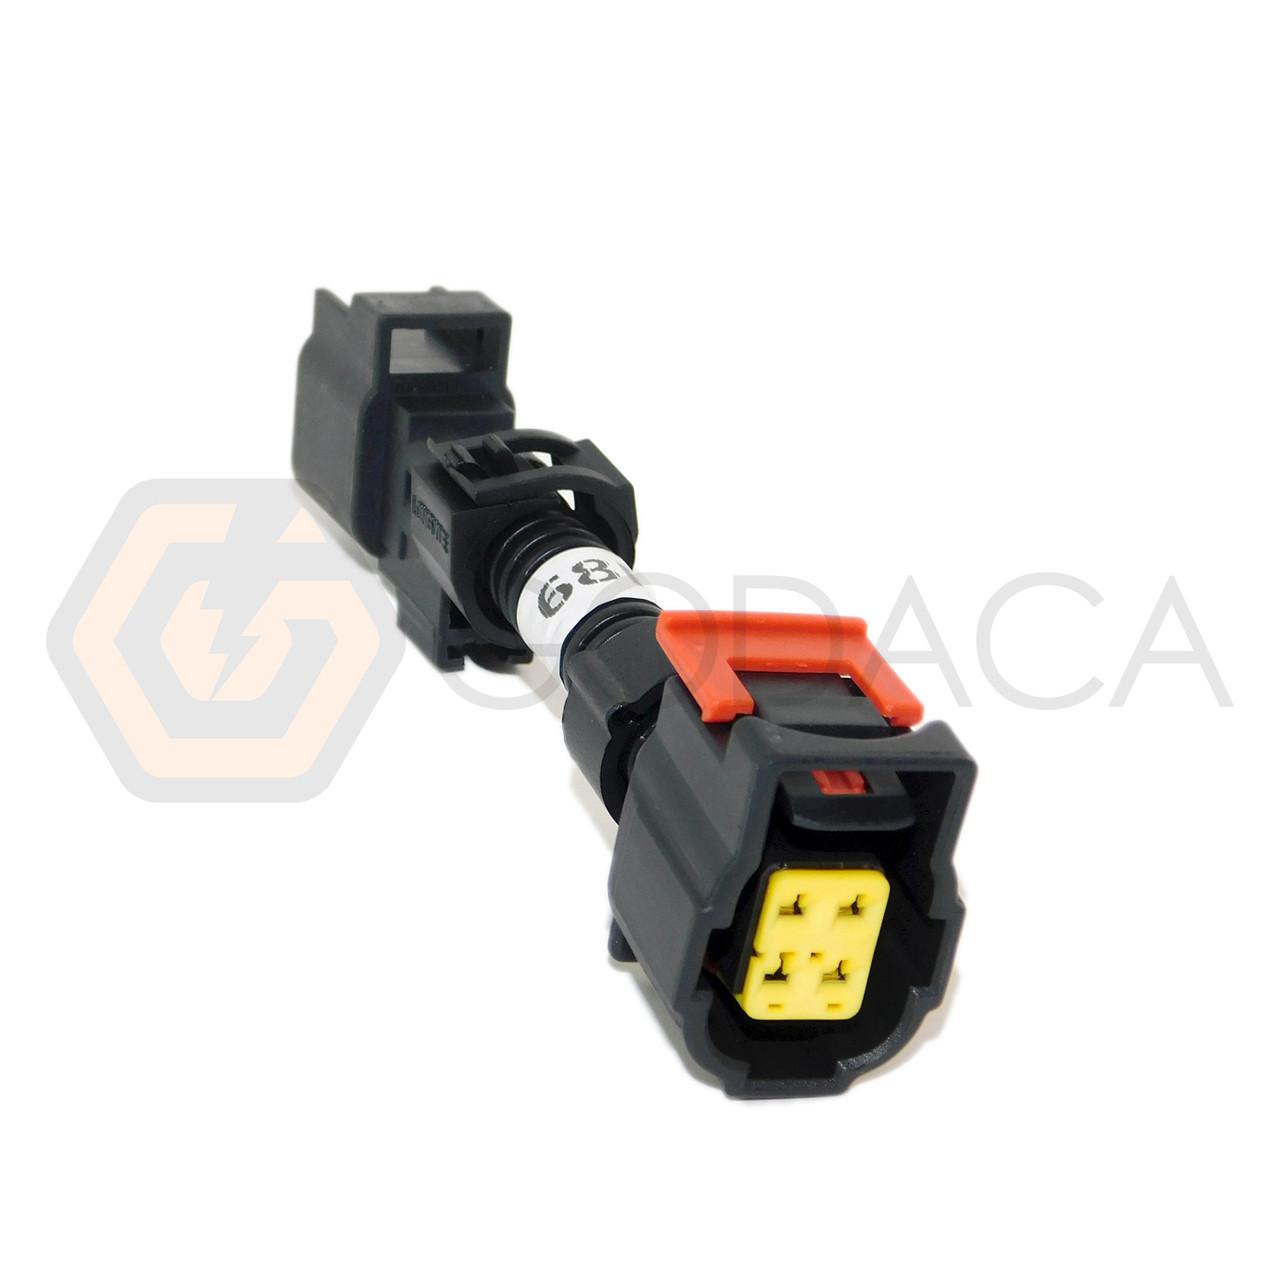 small resolution of 1x wiring harness for dodge chrysler transmission line pressure booster 68rfe godaca llc